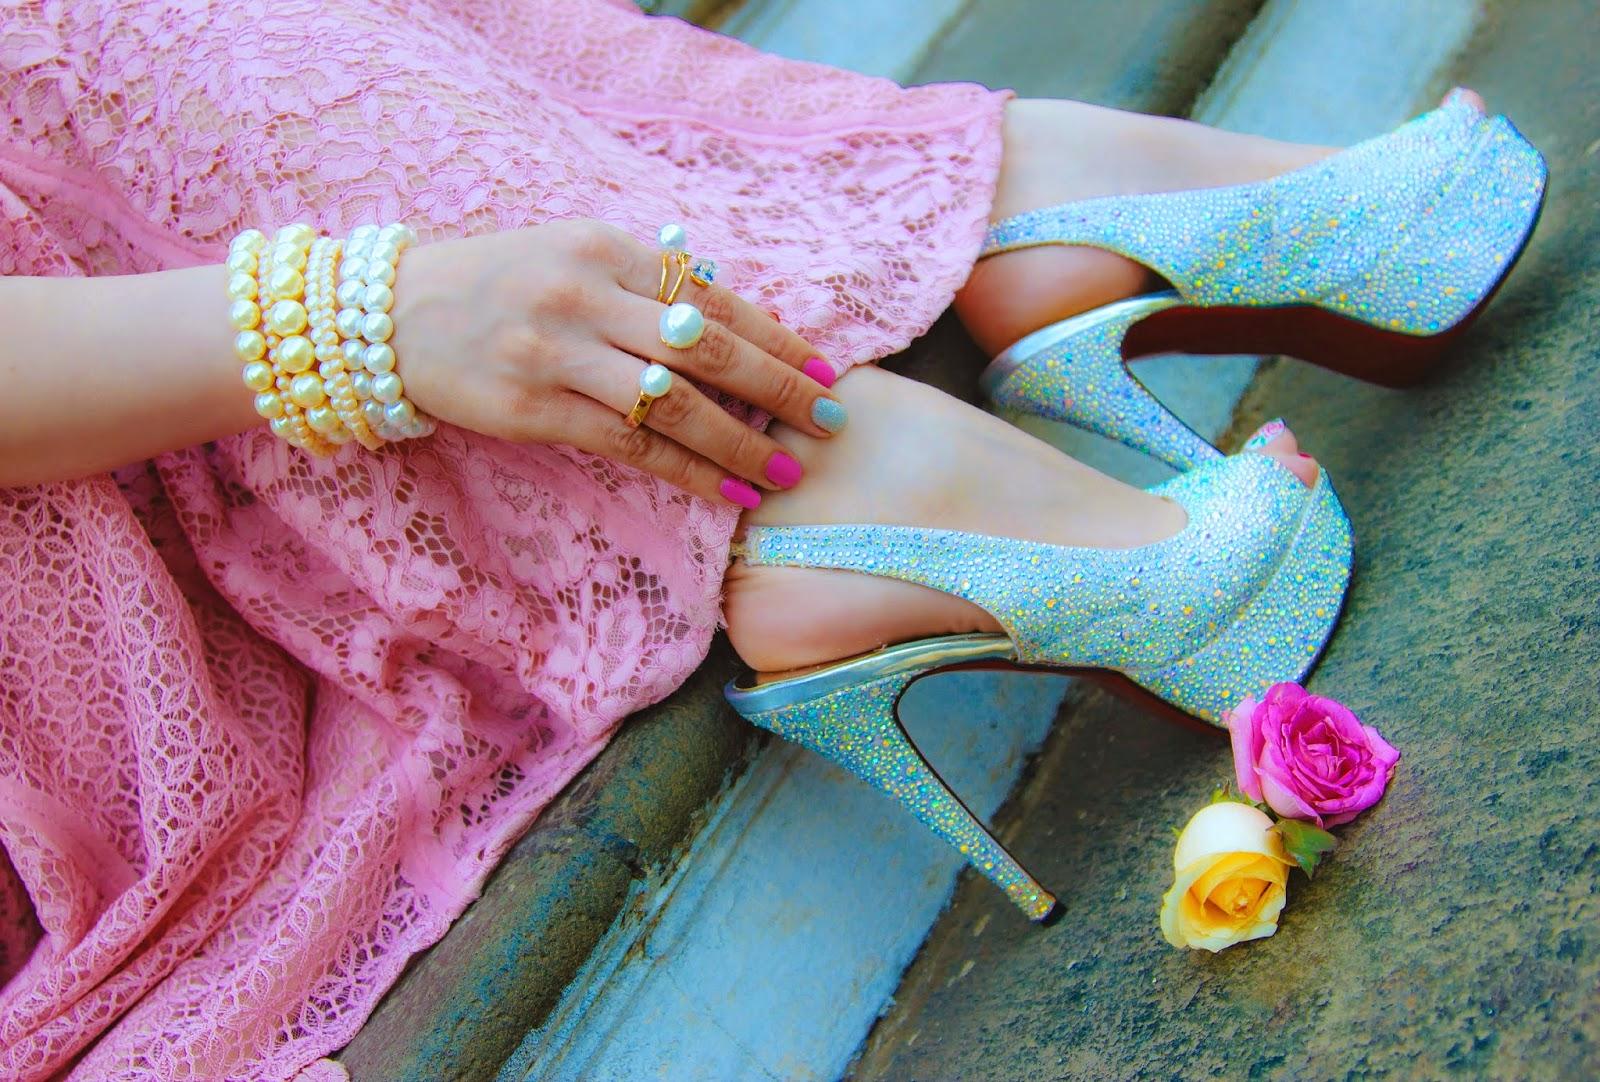 Christian Louboutin Crystal embellished heels, pearl bracelets, pearl rings